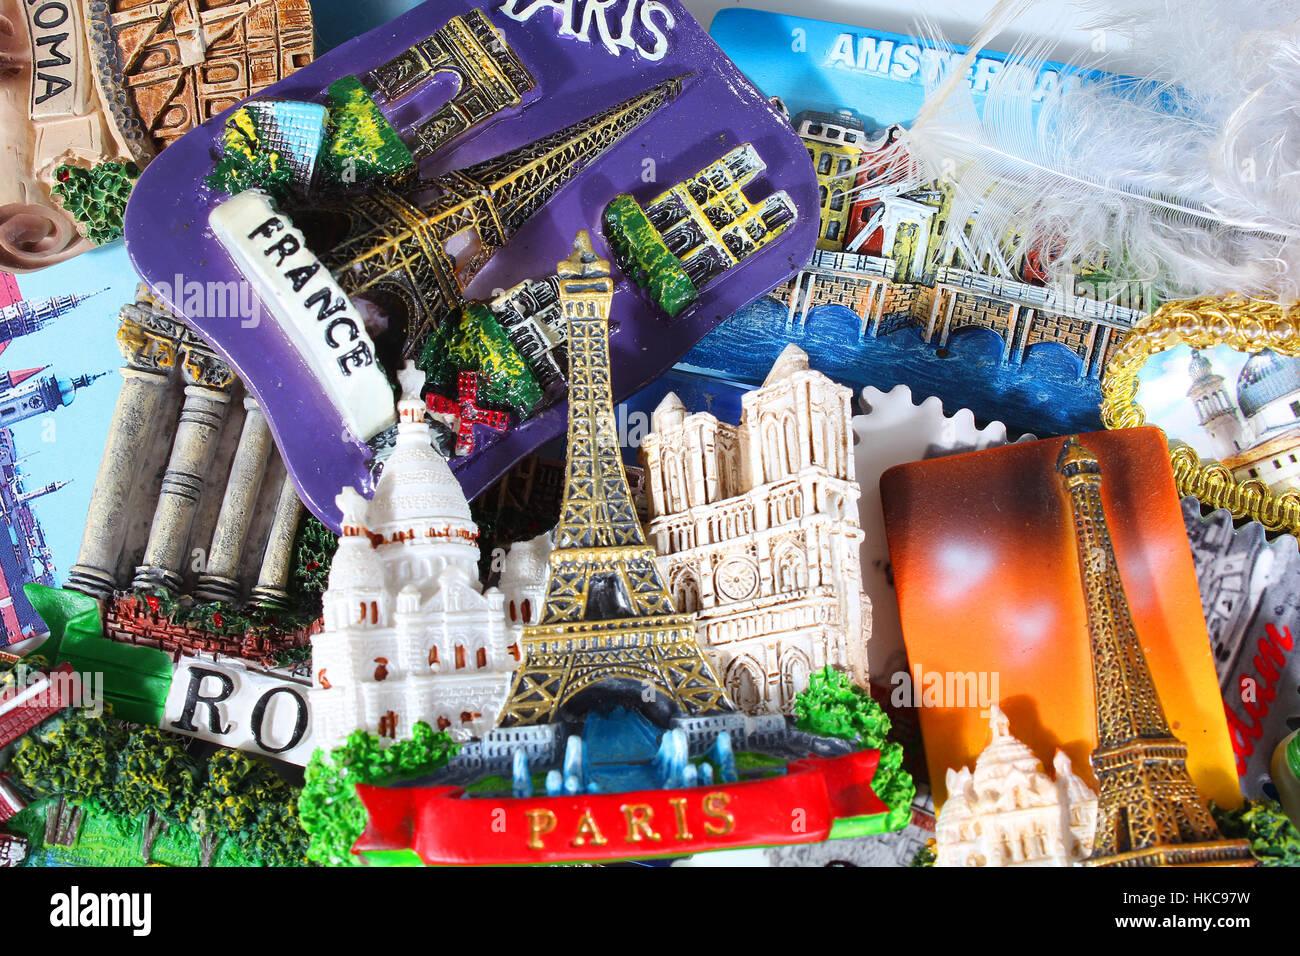 Kühlschrank Magnete : Paris rom tourismus abbildung schönen paris kühlschrank magnet